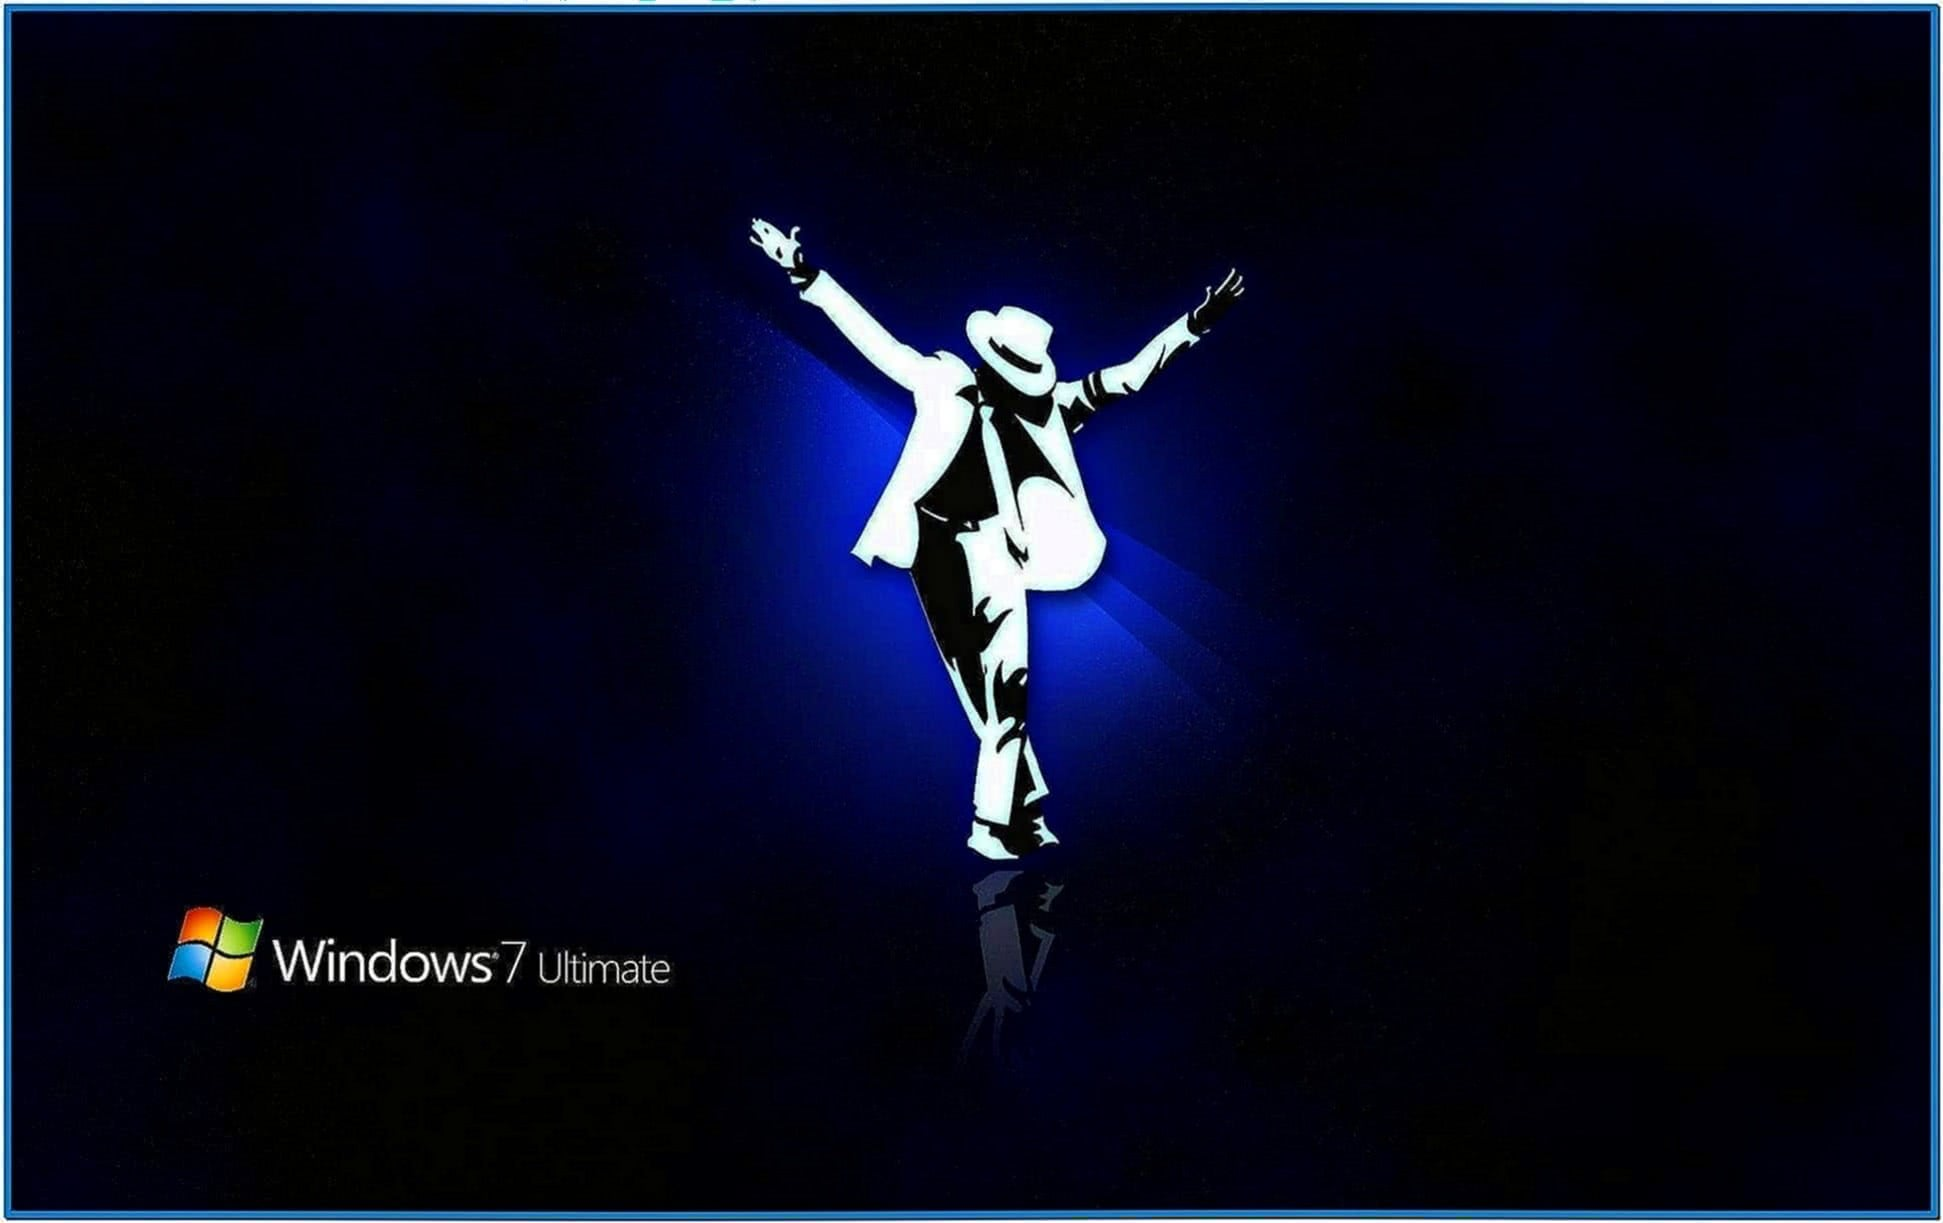 Michael Jackson Screensavers and Wallpaper